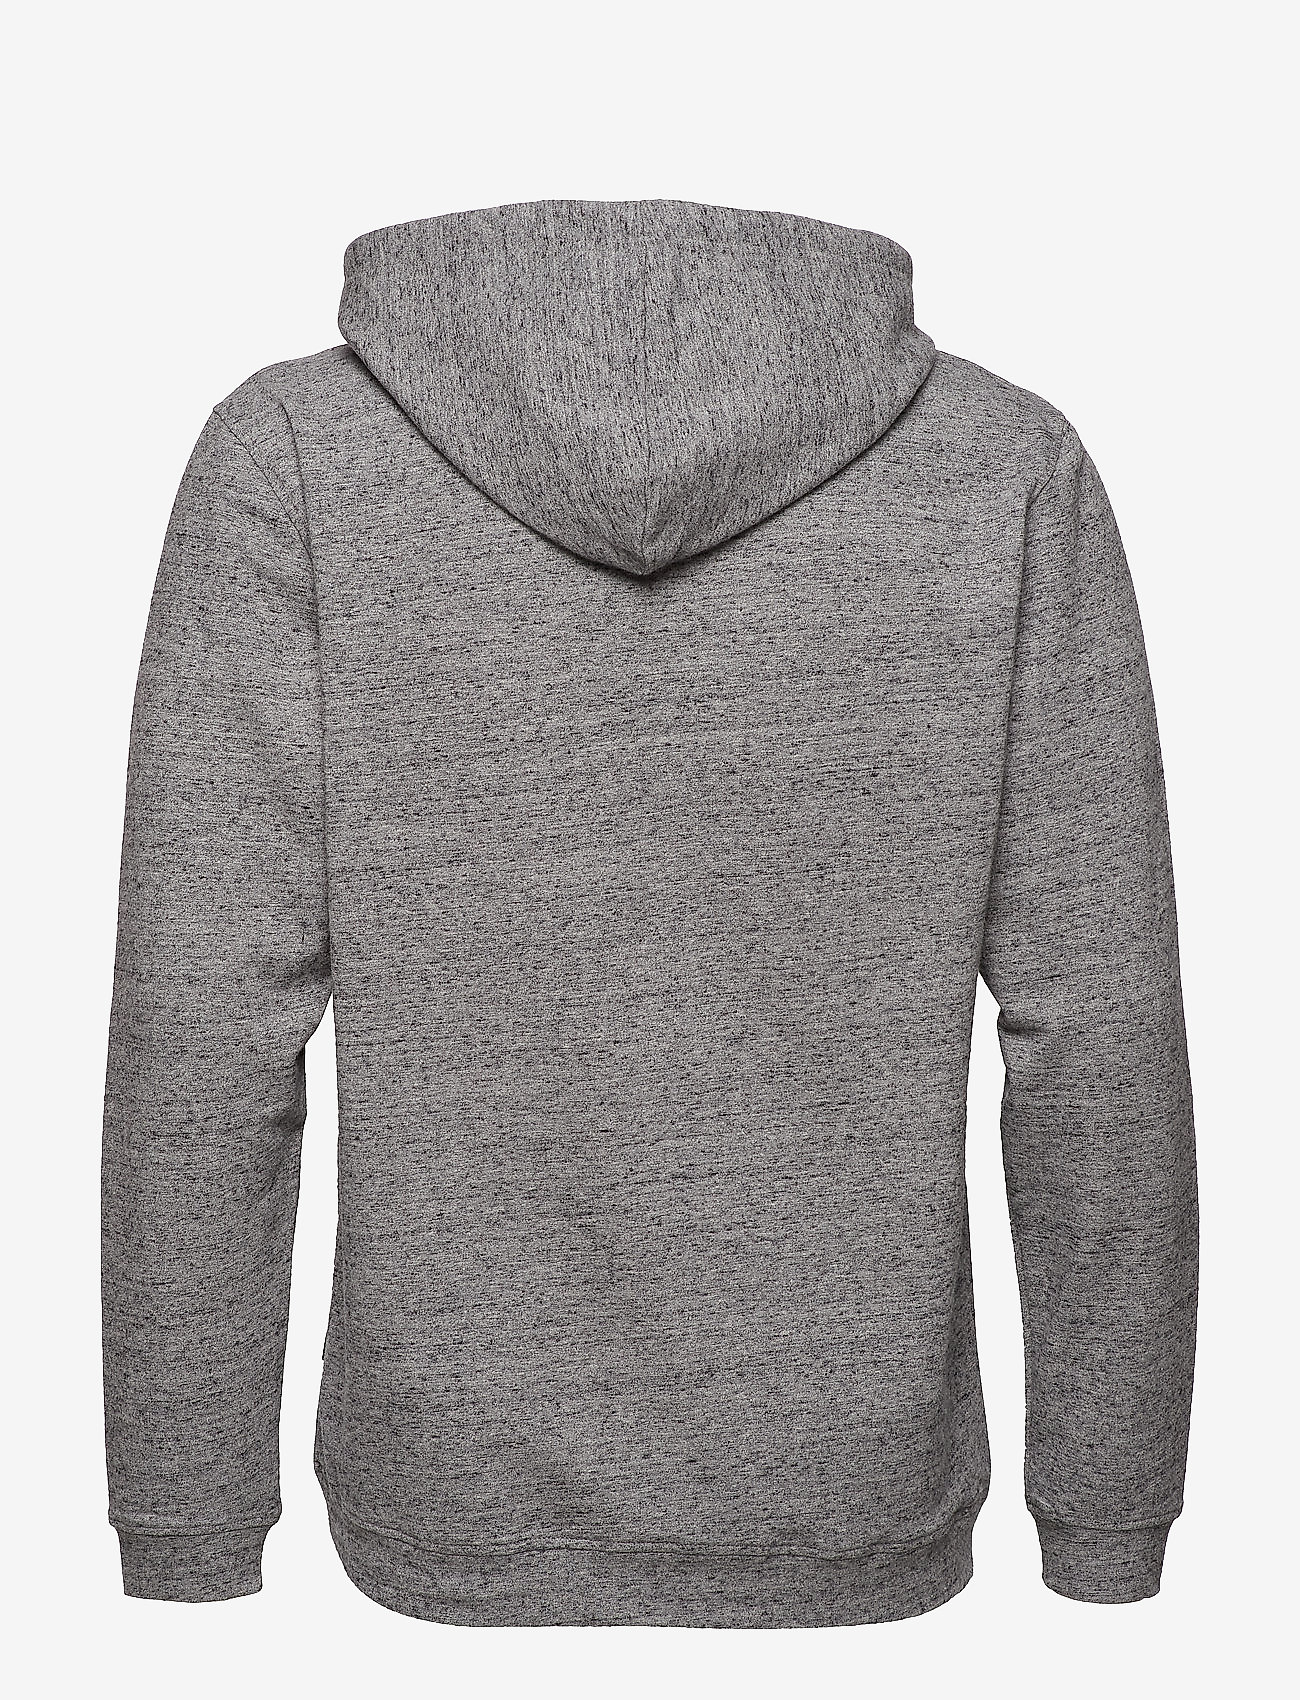 JBS of Denmark JBS of Denmark, sweat hoodie - Sweatshirts GREY MELAN - Menn Klær